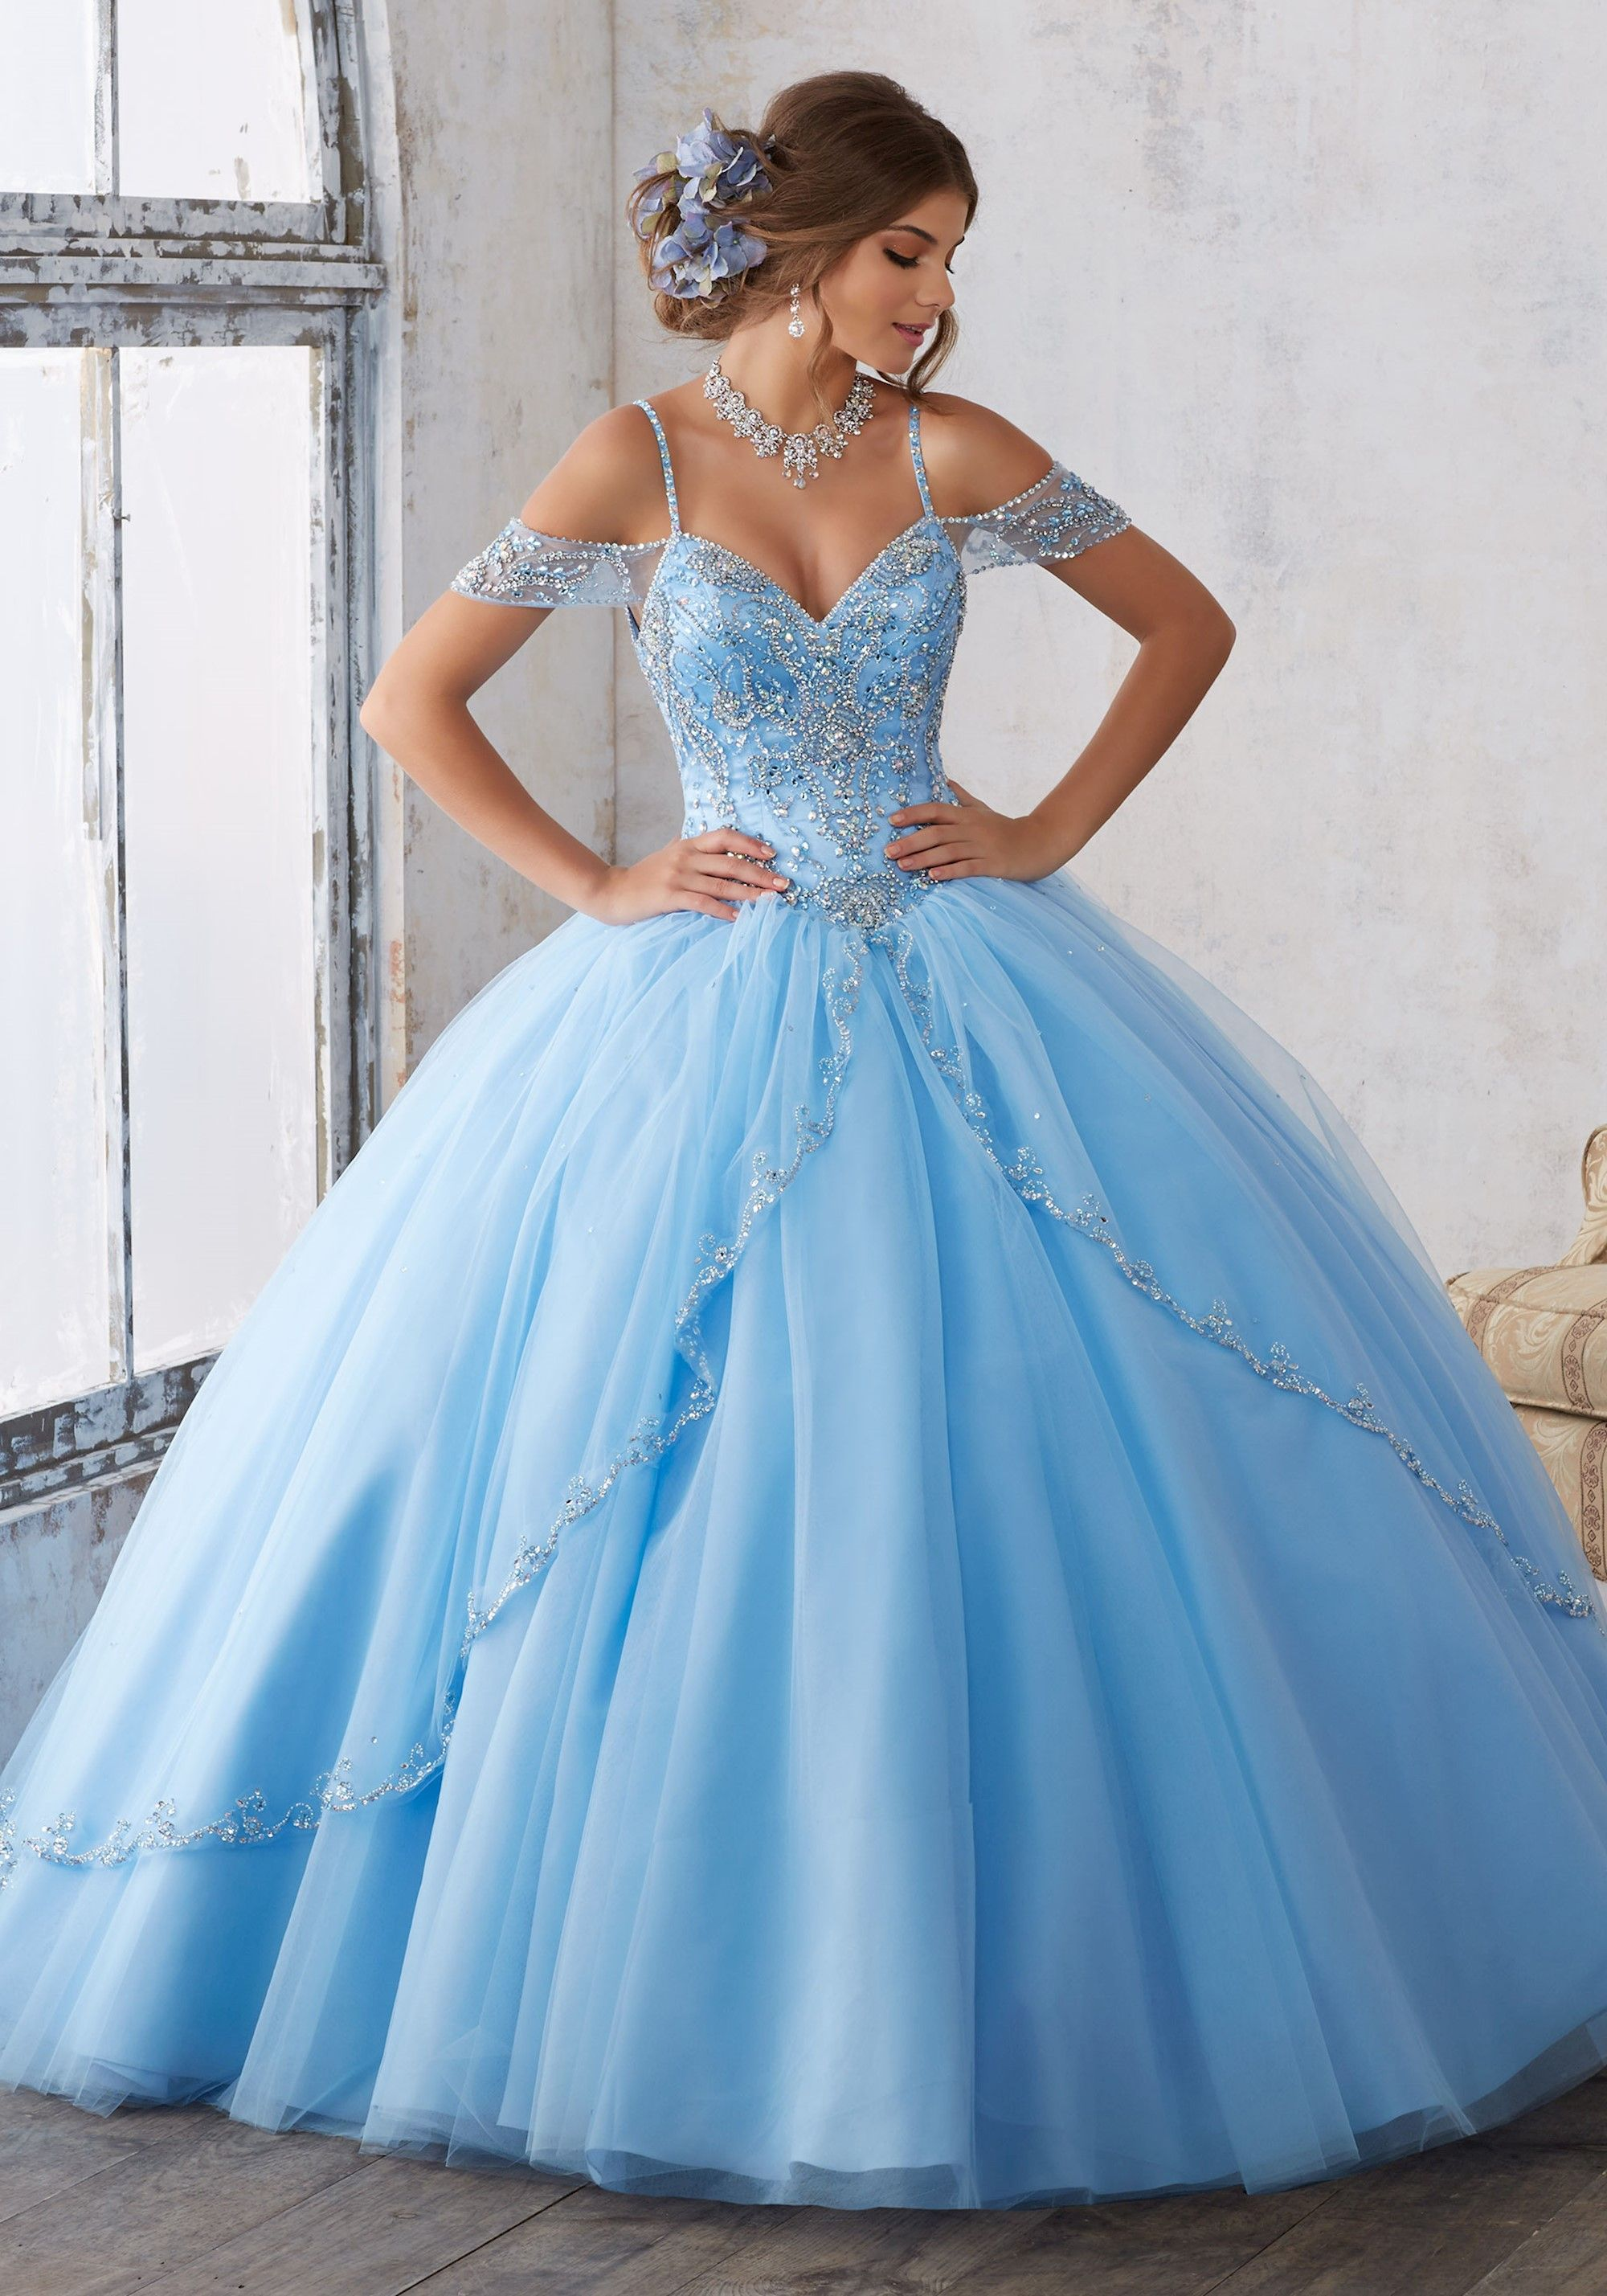 File ad05dc1cb4 original Cinderella Quinceanera Dress e899617d7c89